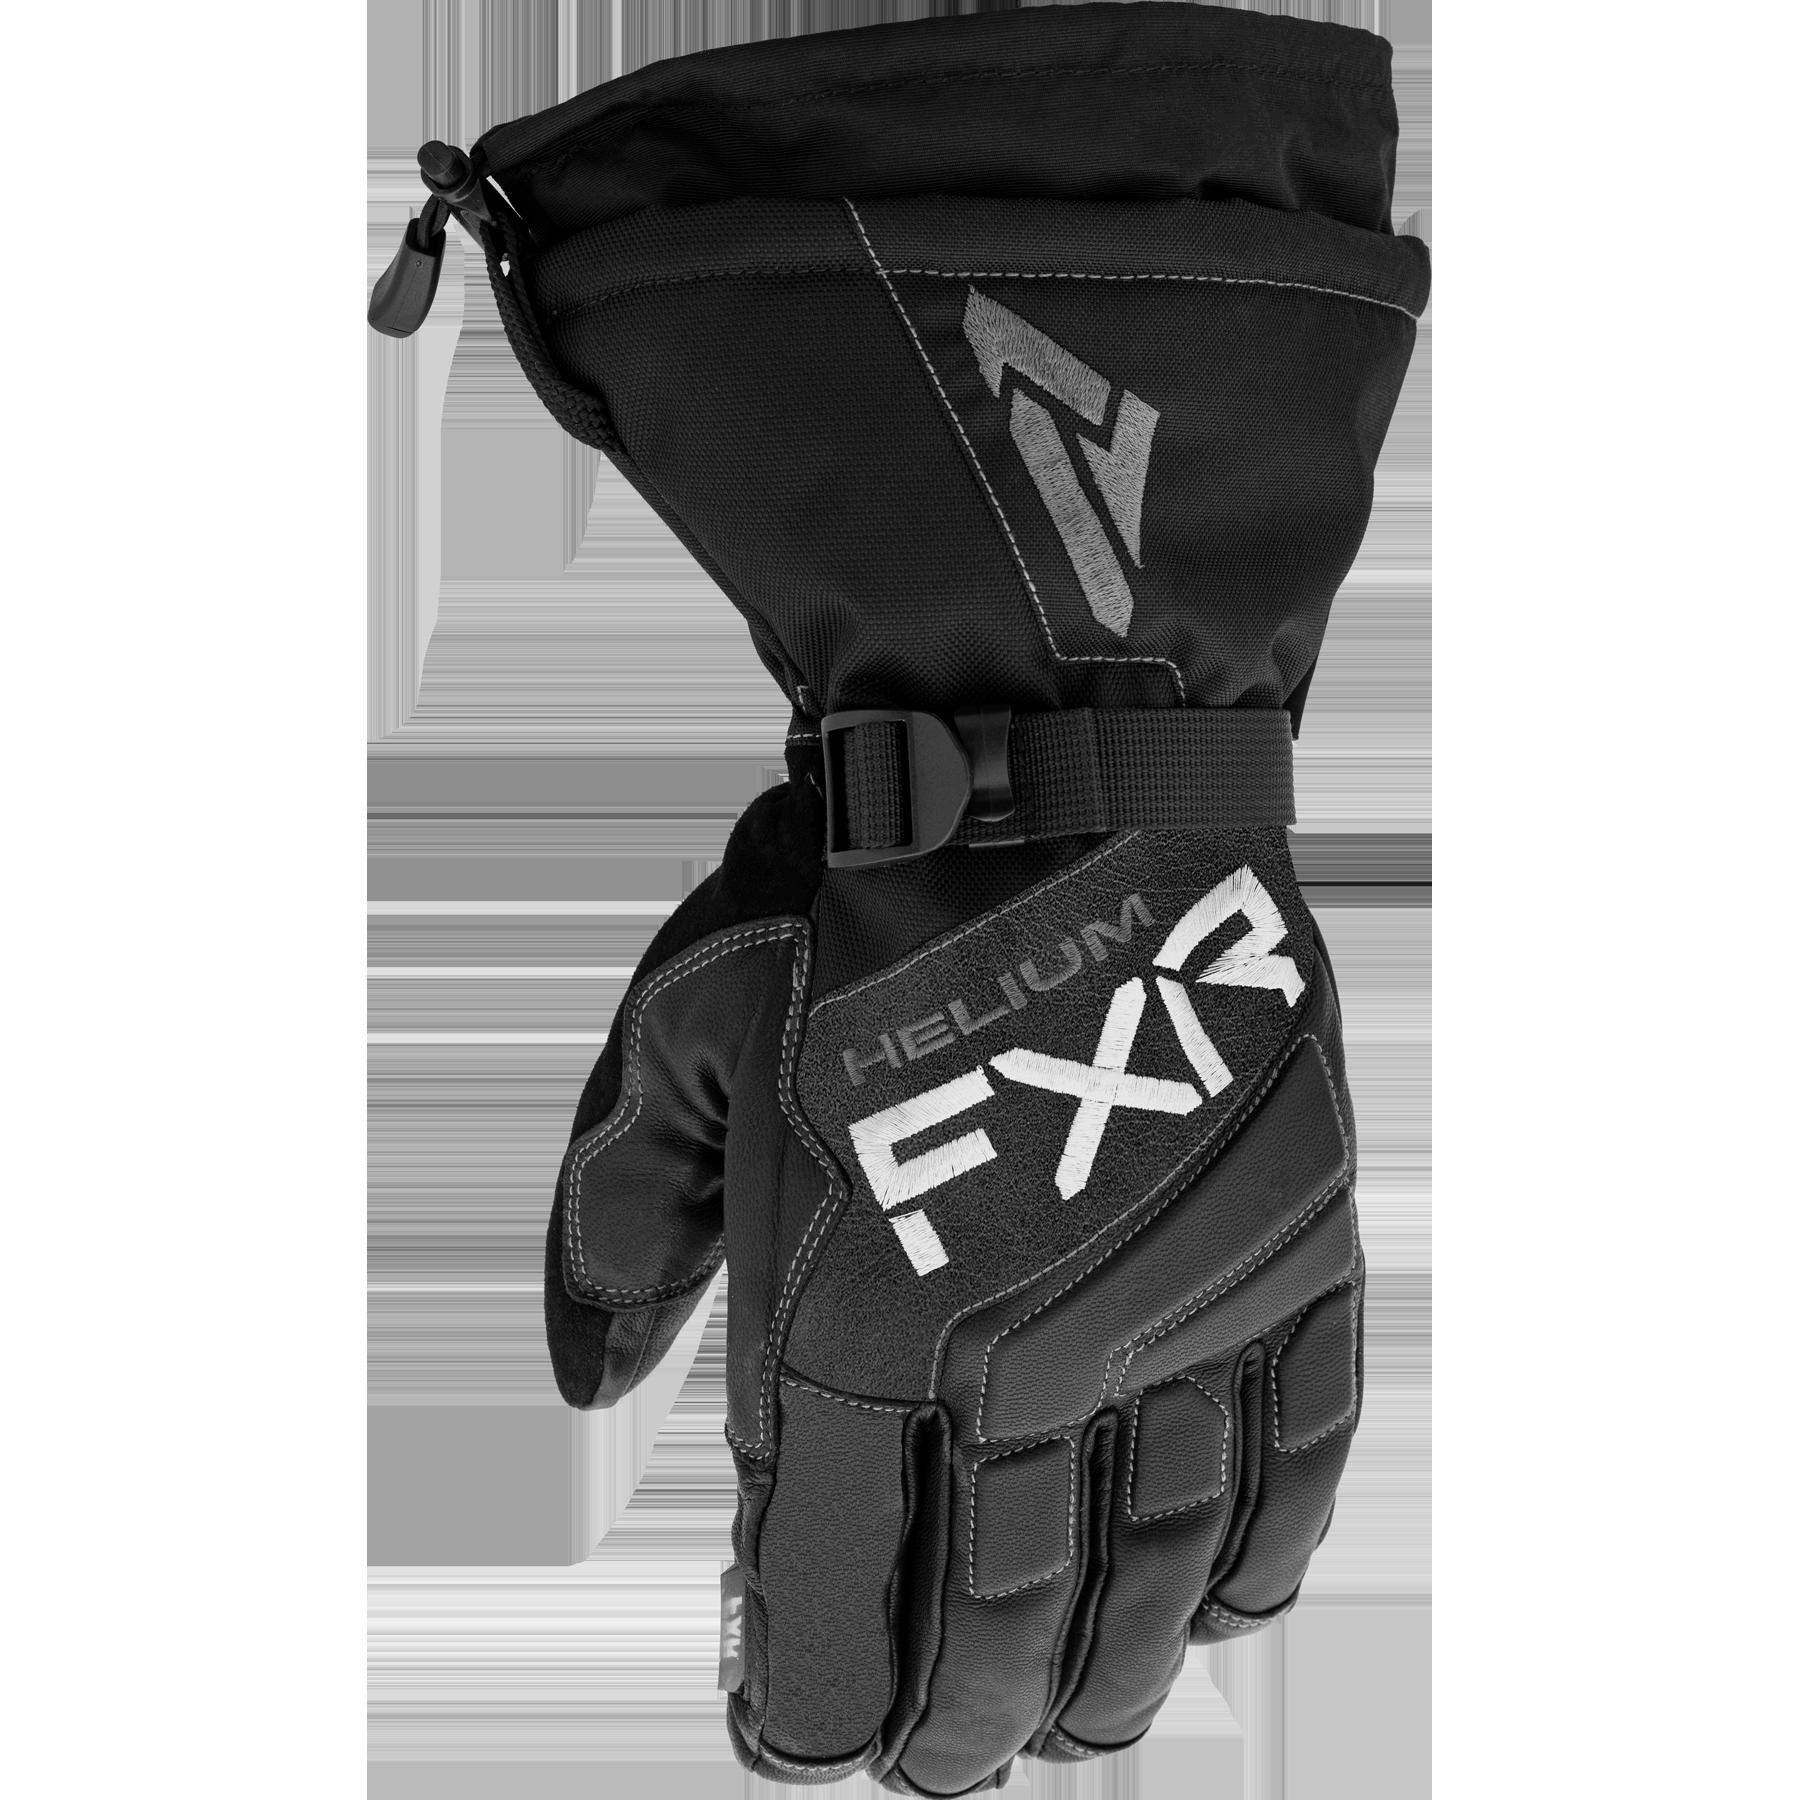 Hybrid Helium leather Gauntlet Glove 22 KI 6